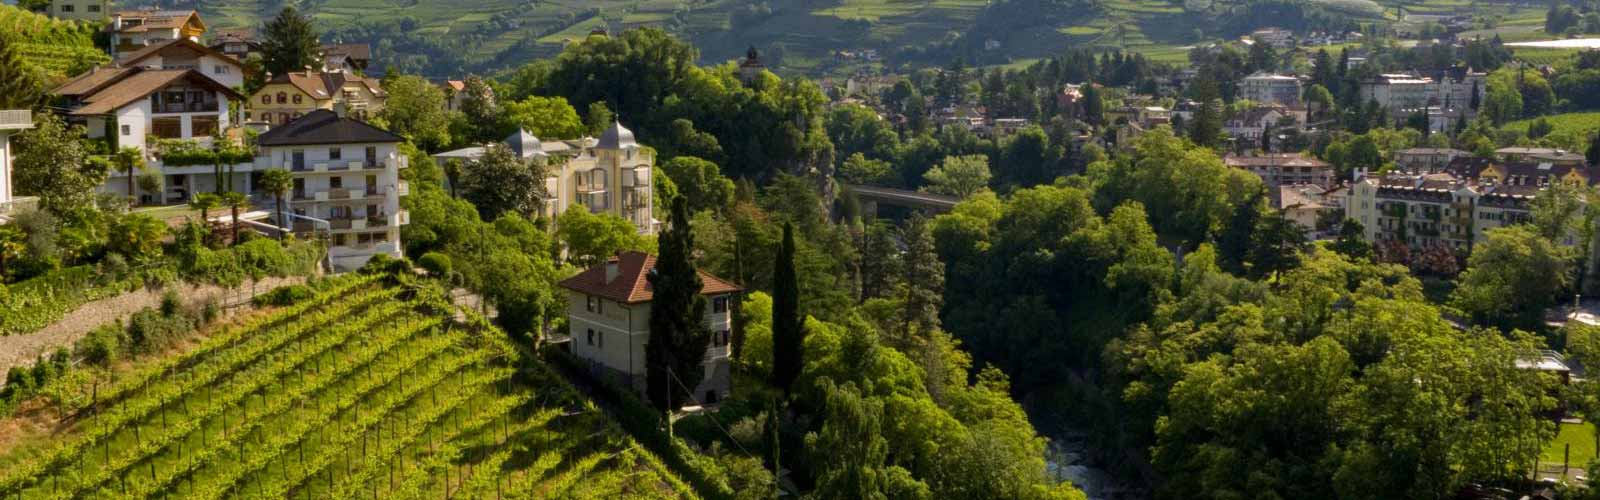 Weinberge in Süd Tirol